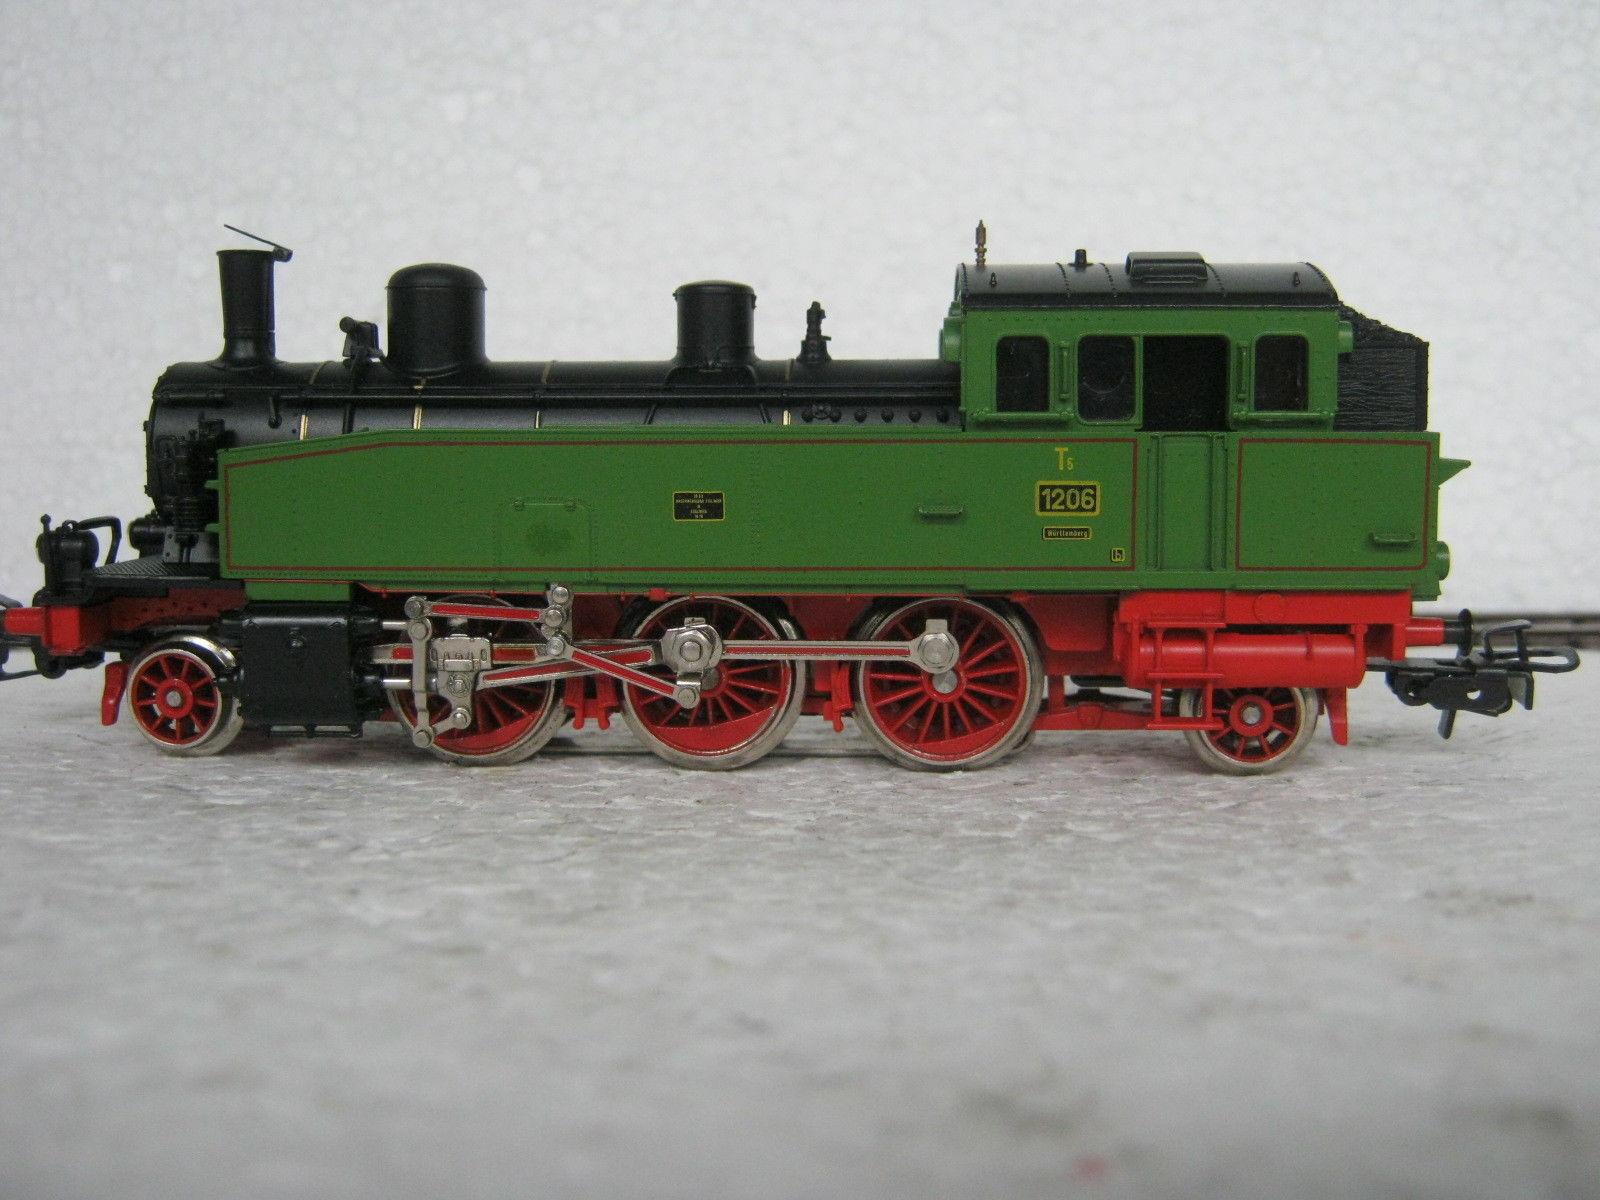 HO 3312 locomotiva T 5 btrnr 1206 Württemberg  co/65-40r7/16